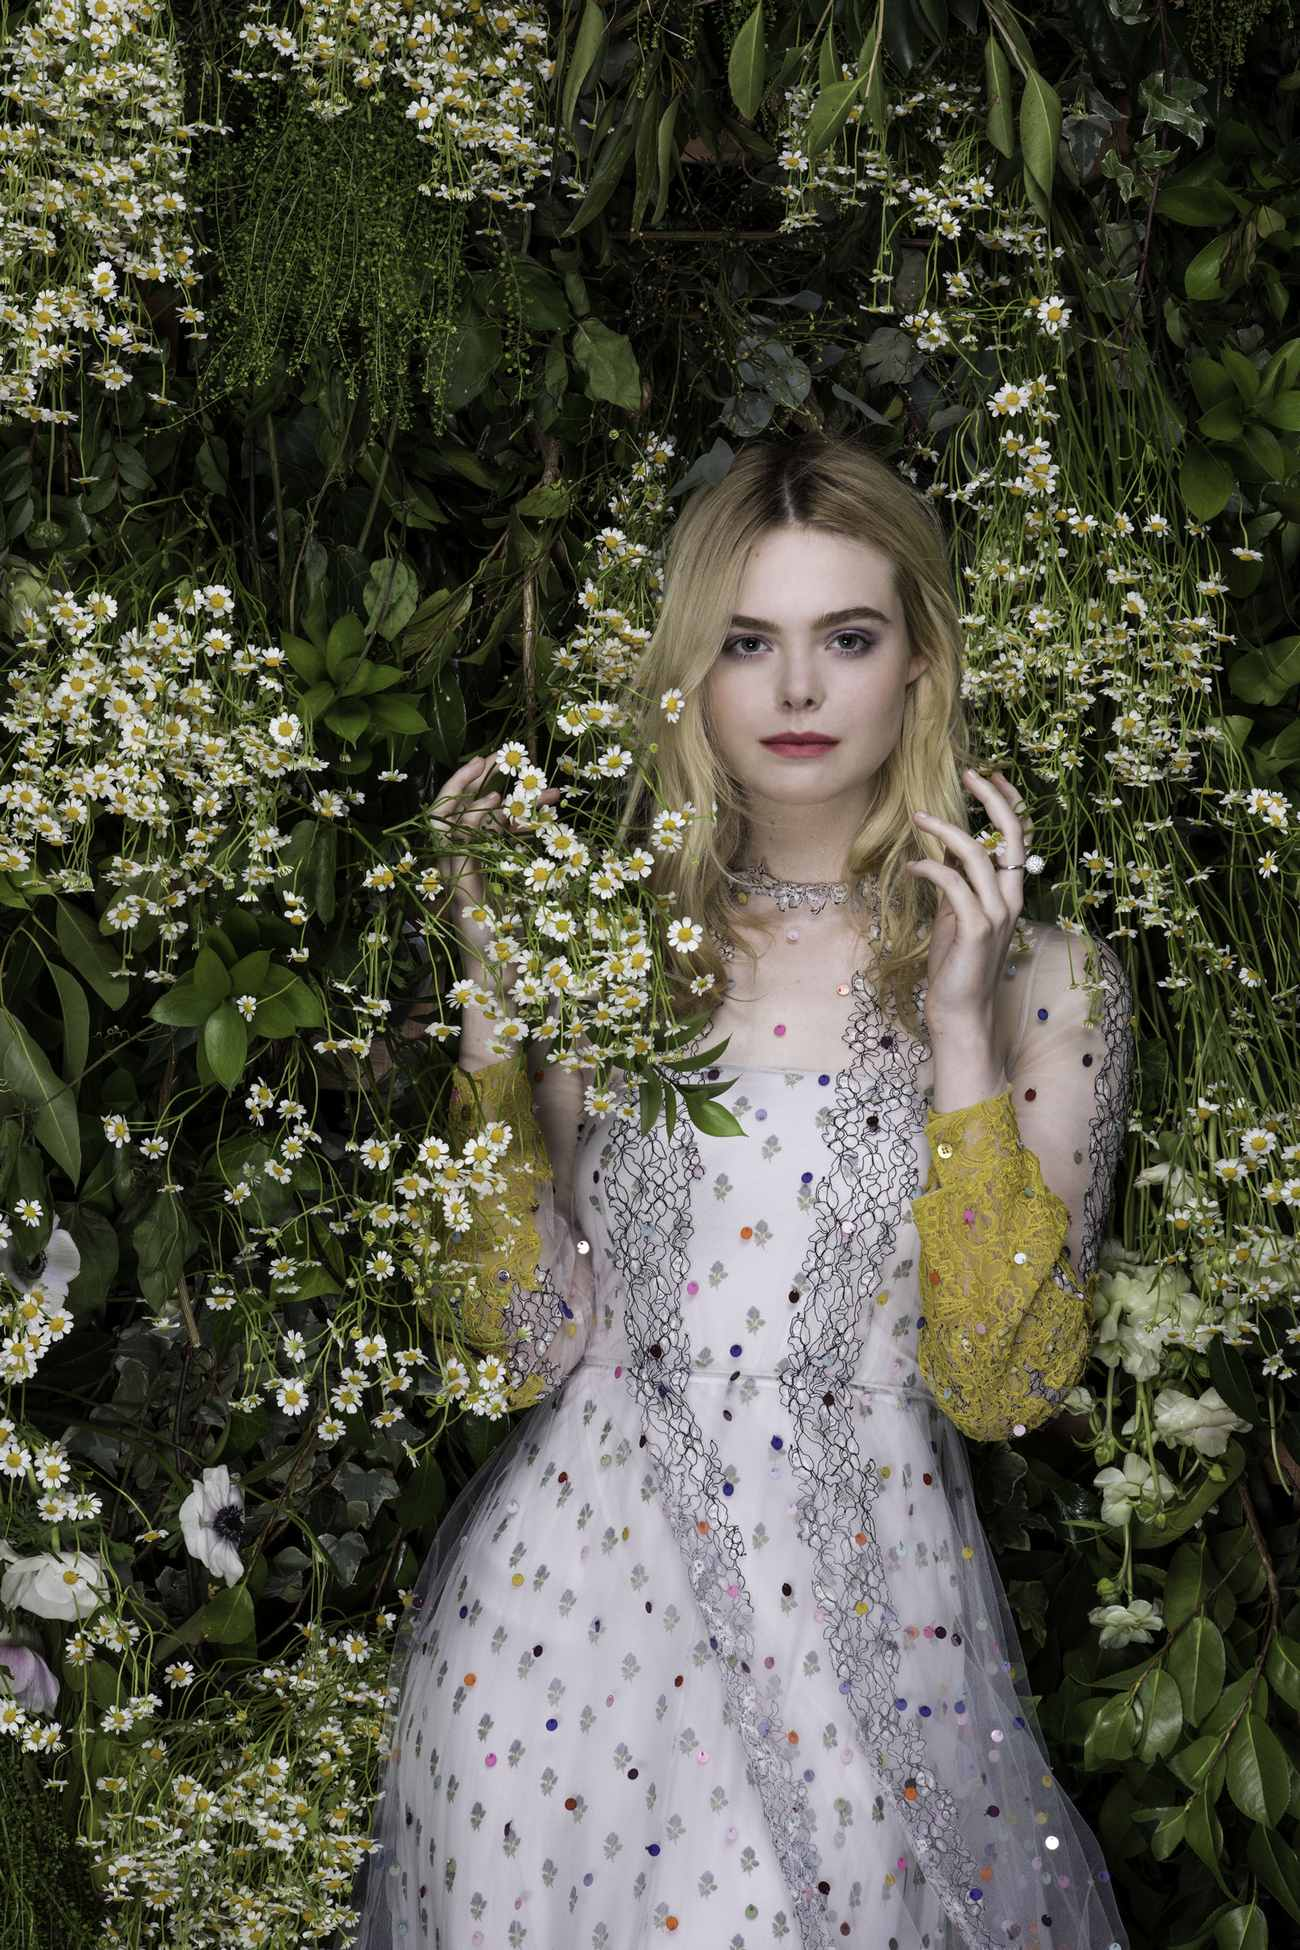 Elle-Fanning-Vanity-Fair-Italia-June-201800002.jpg